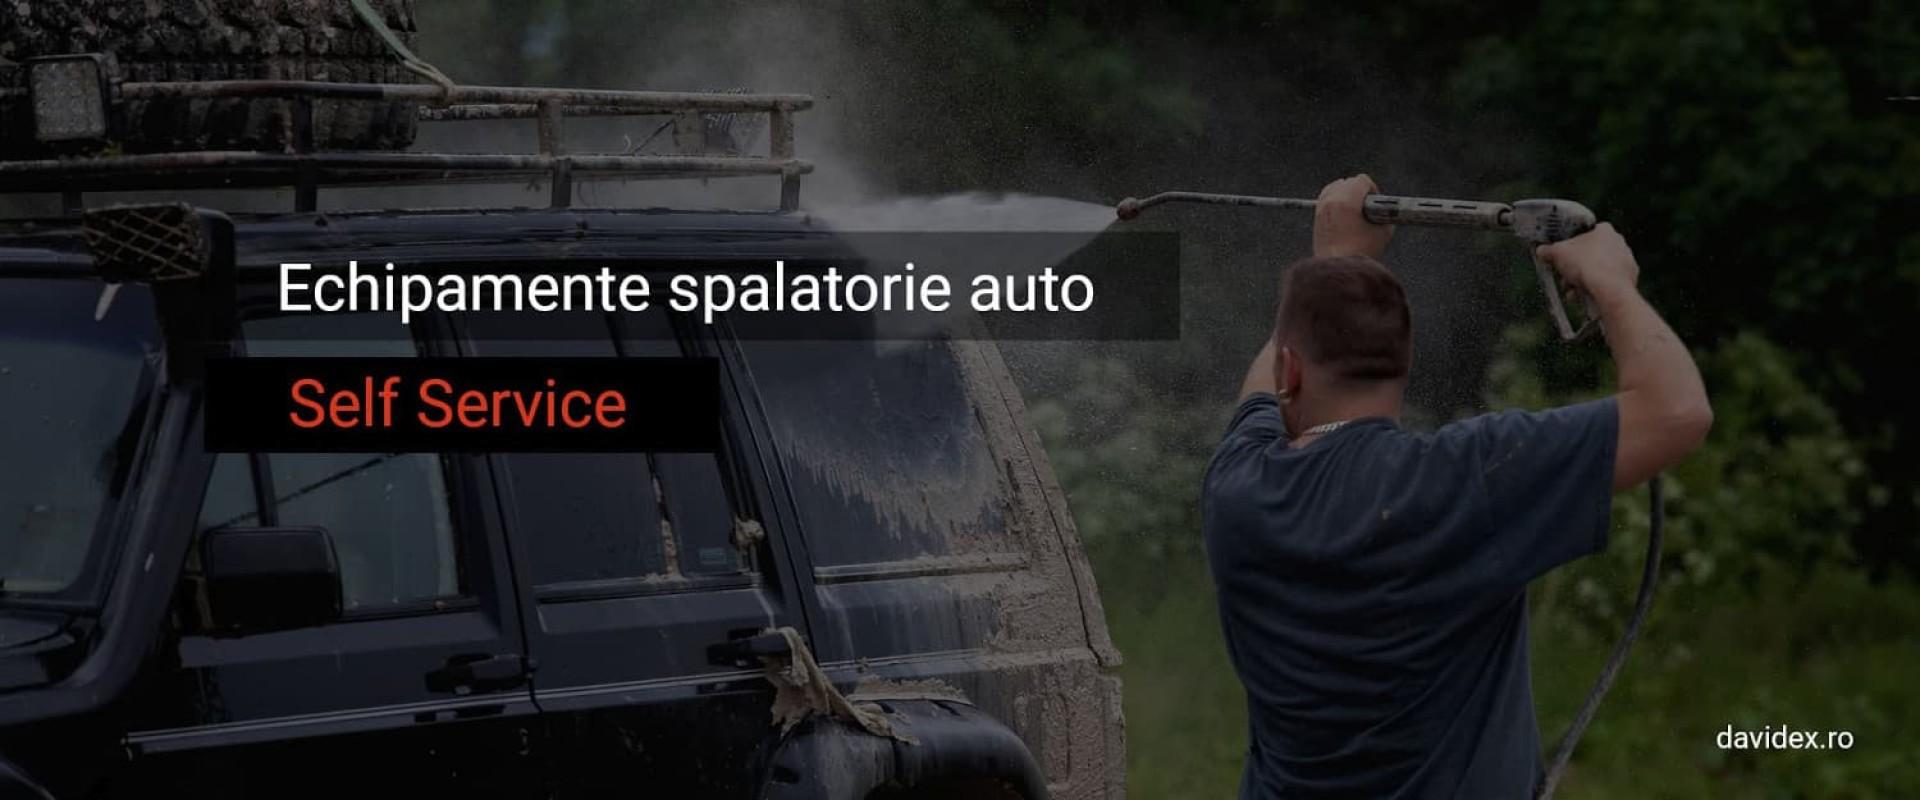 Echipamente spalatorie auto Self Service